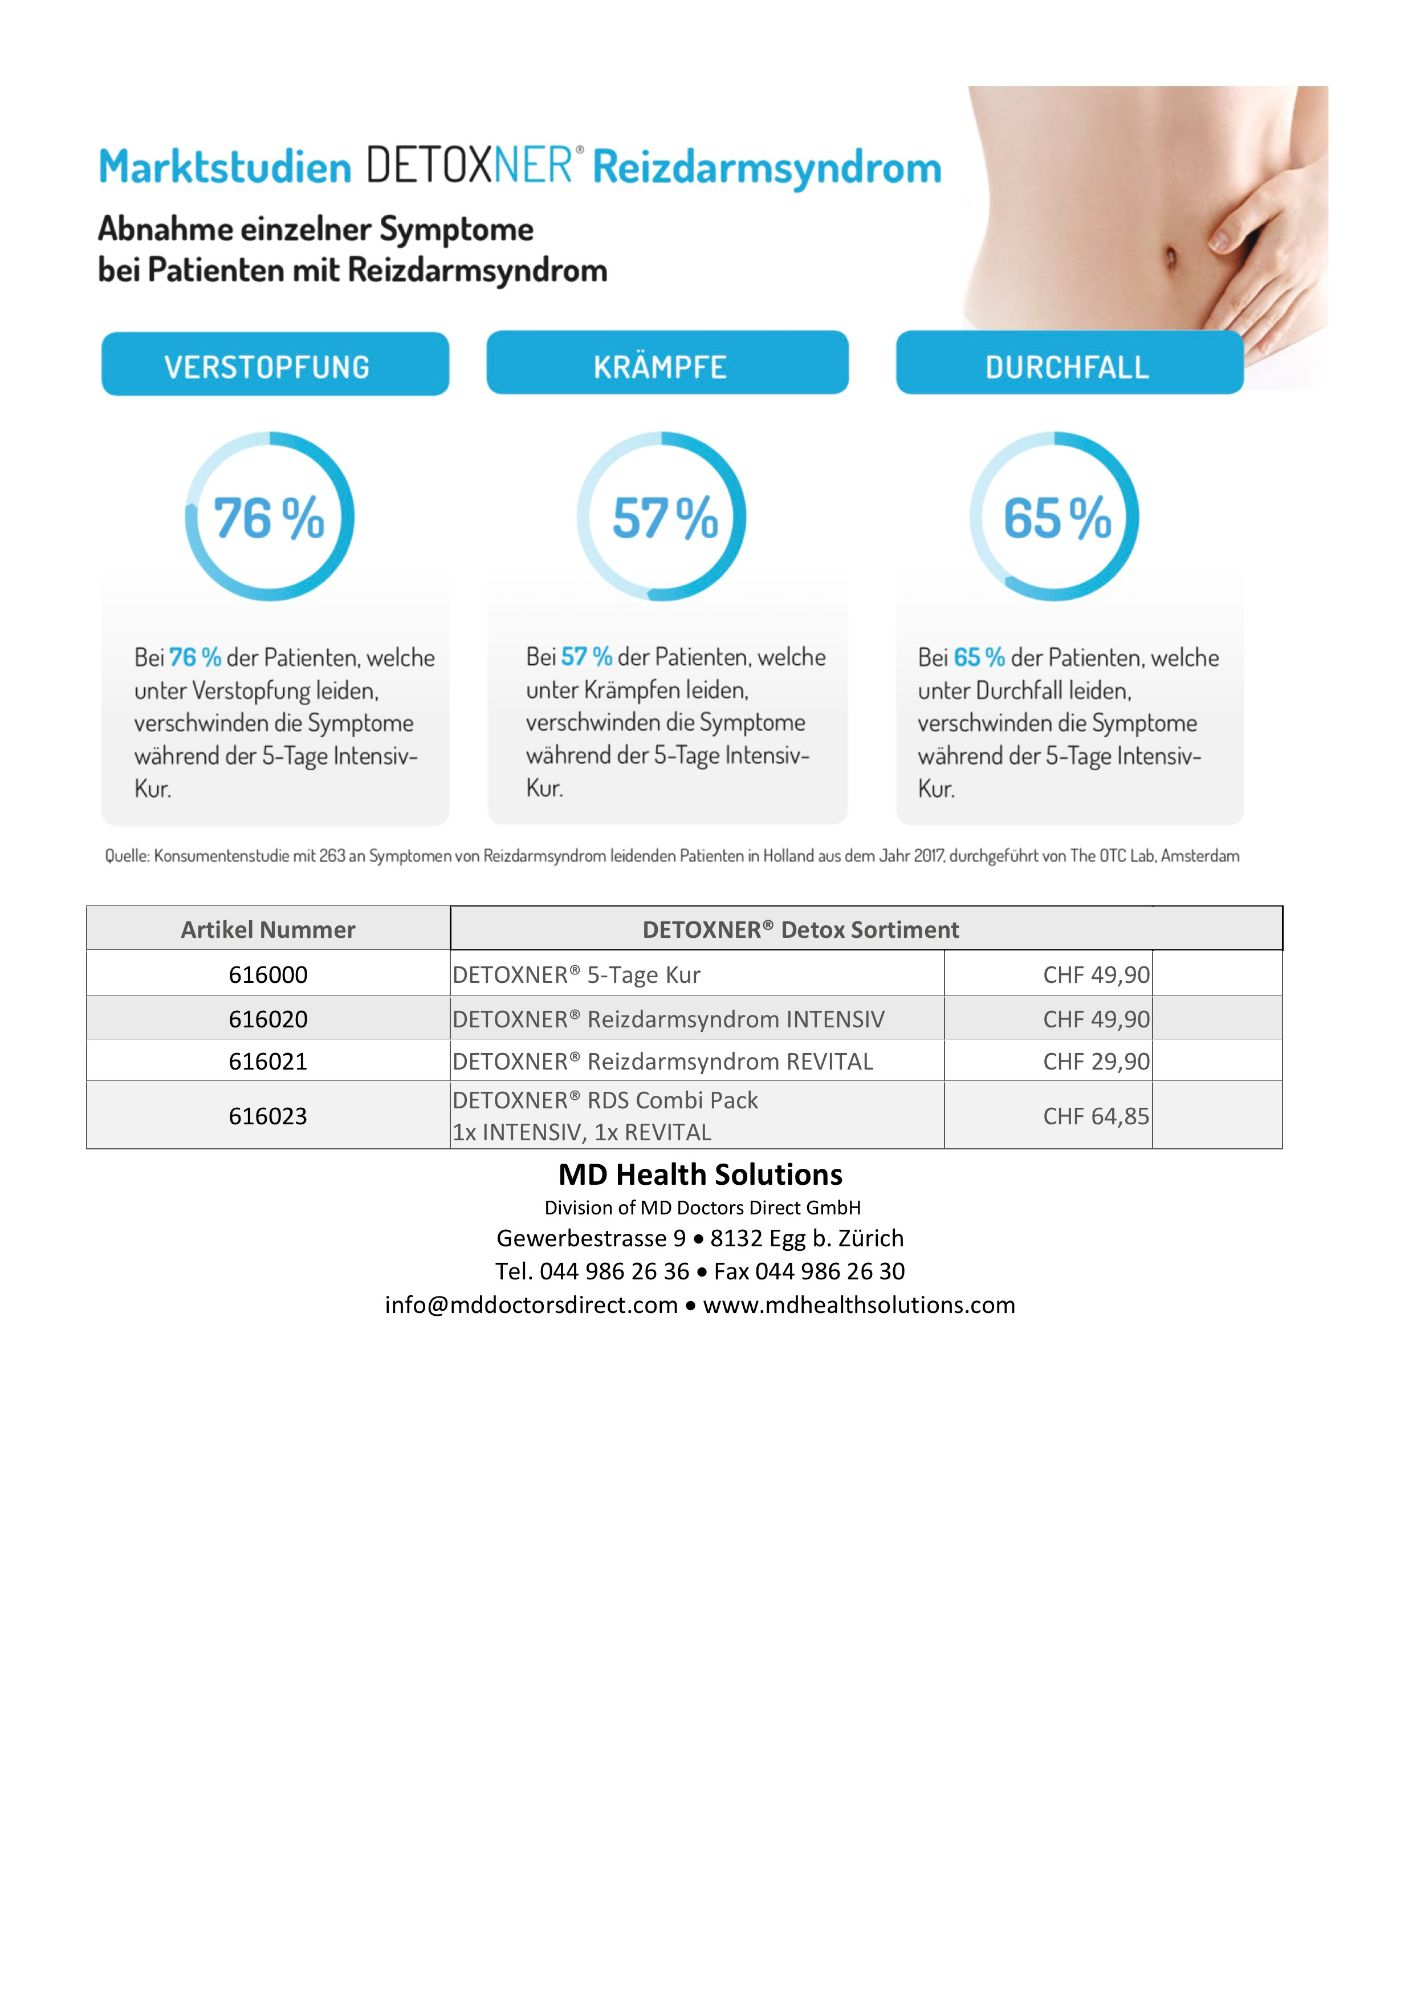 Detoxner® Flyer MDDD Web5